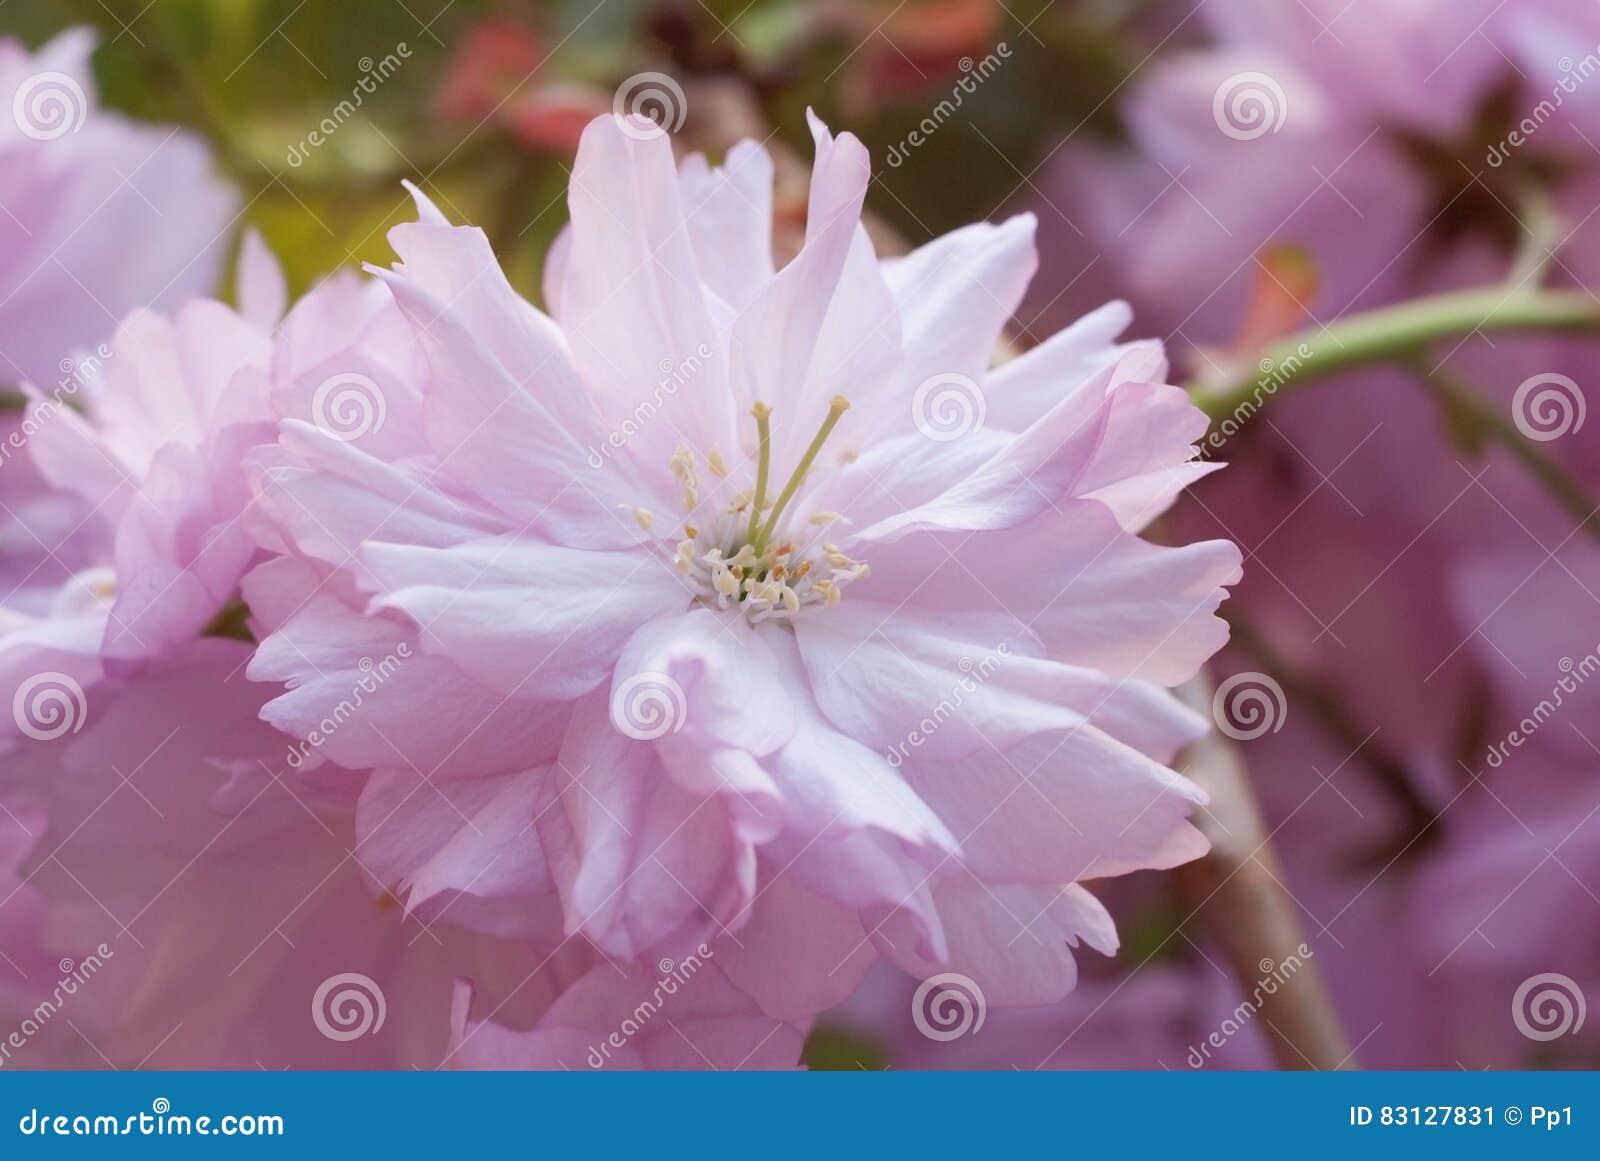 Sakura Chinese Japan Cherry Tree Pink Flower Bloom Blossom Spring